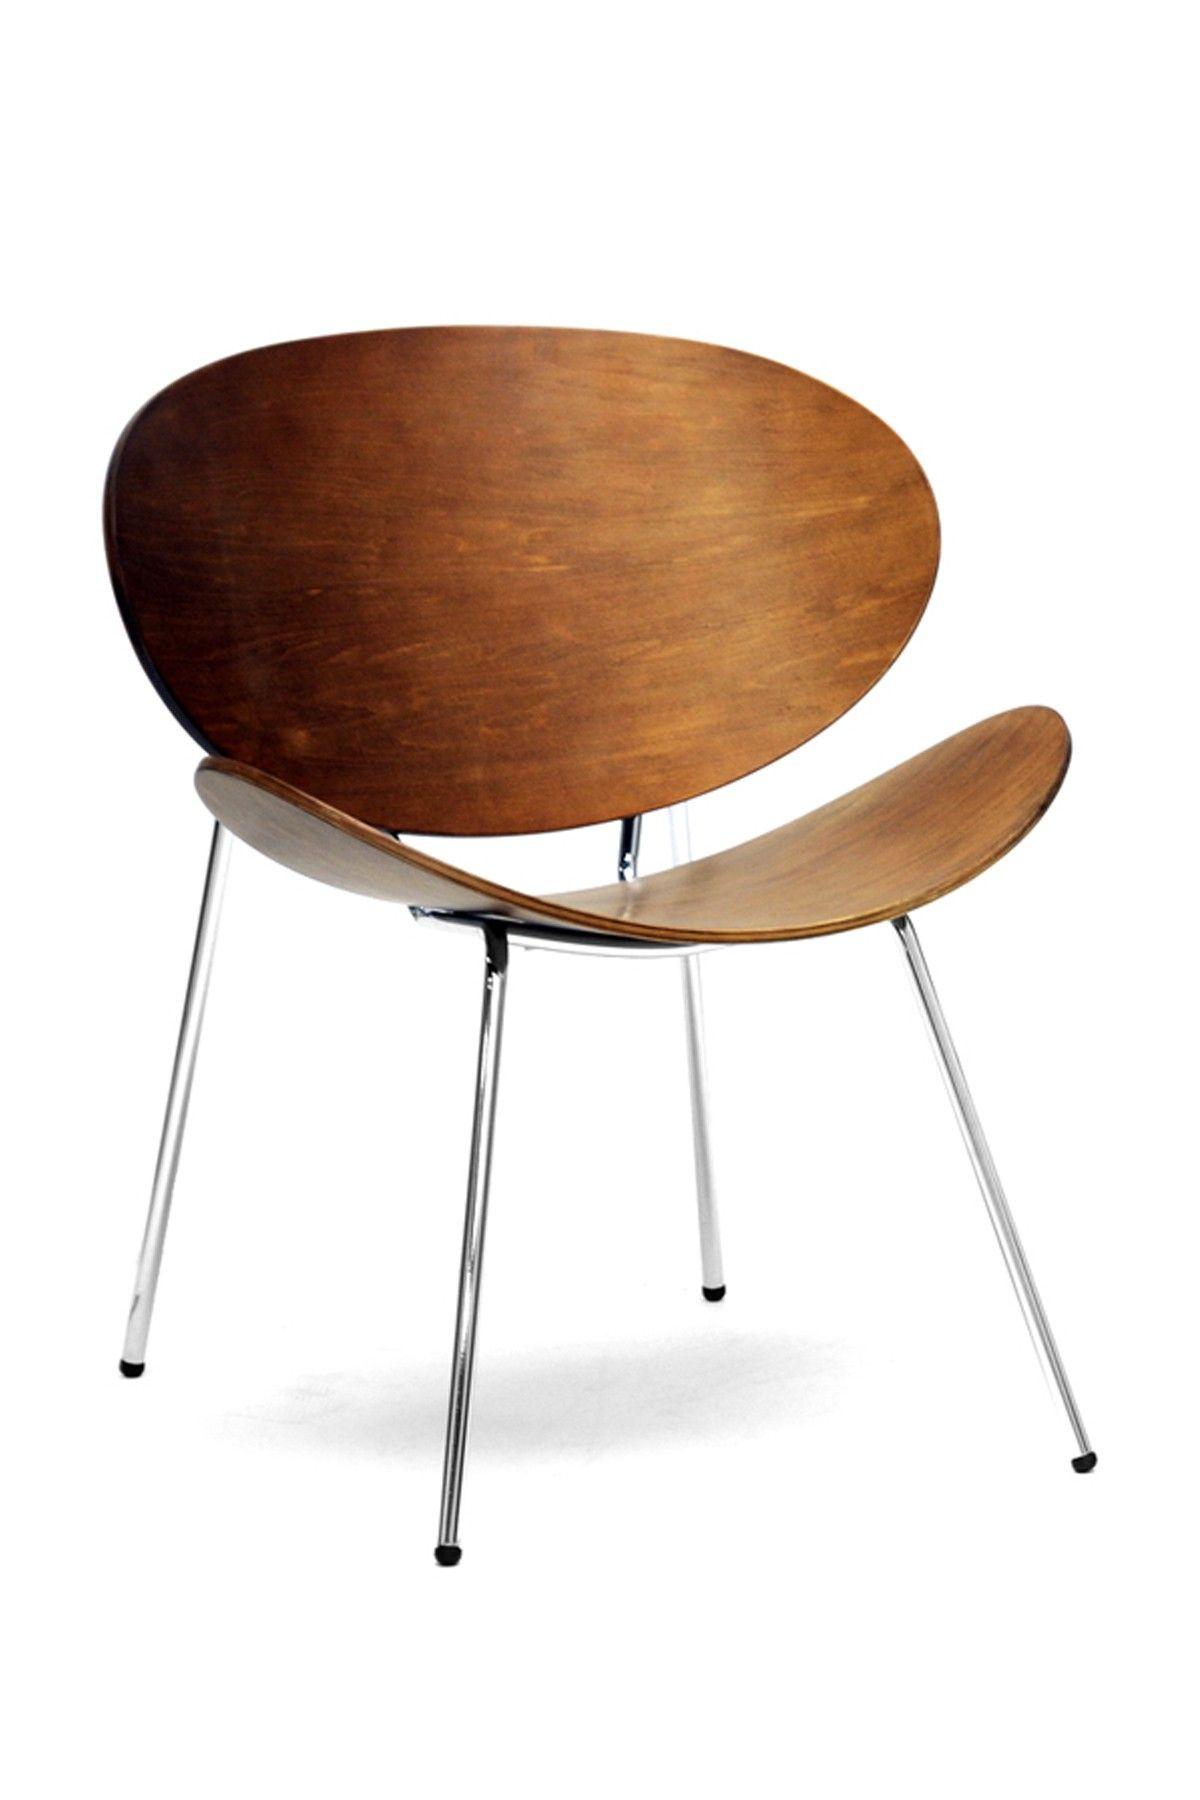 Reaves Walnut Mid Century Modern Accent Chairs   Set Of 2 On HauteLook